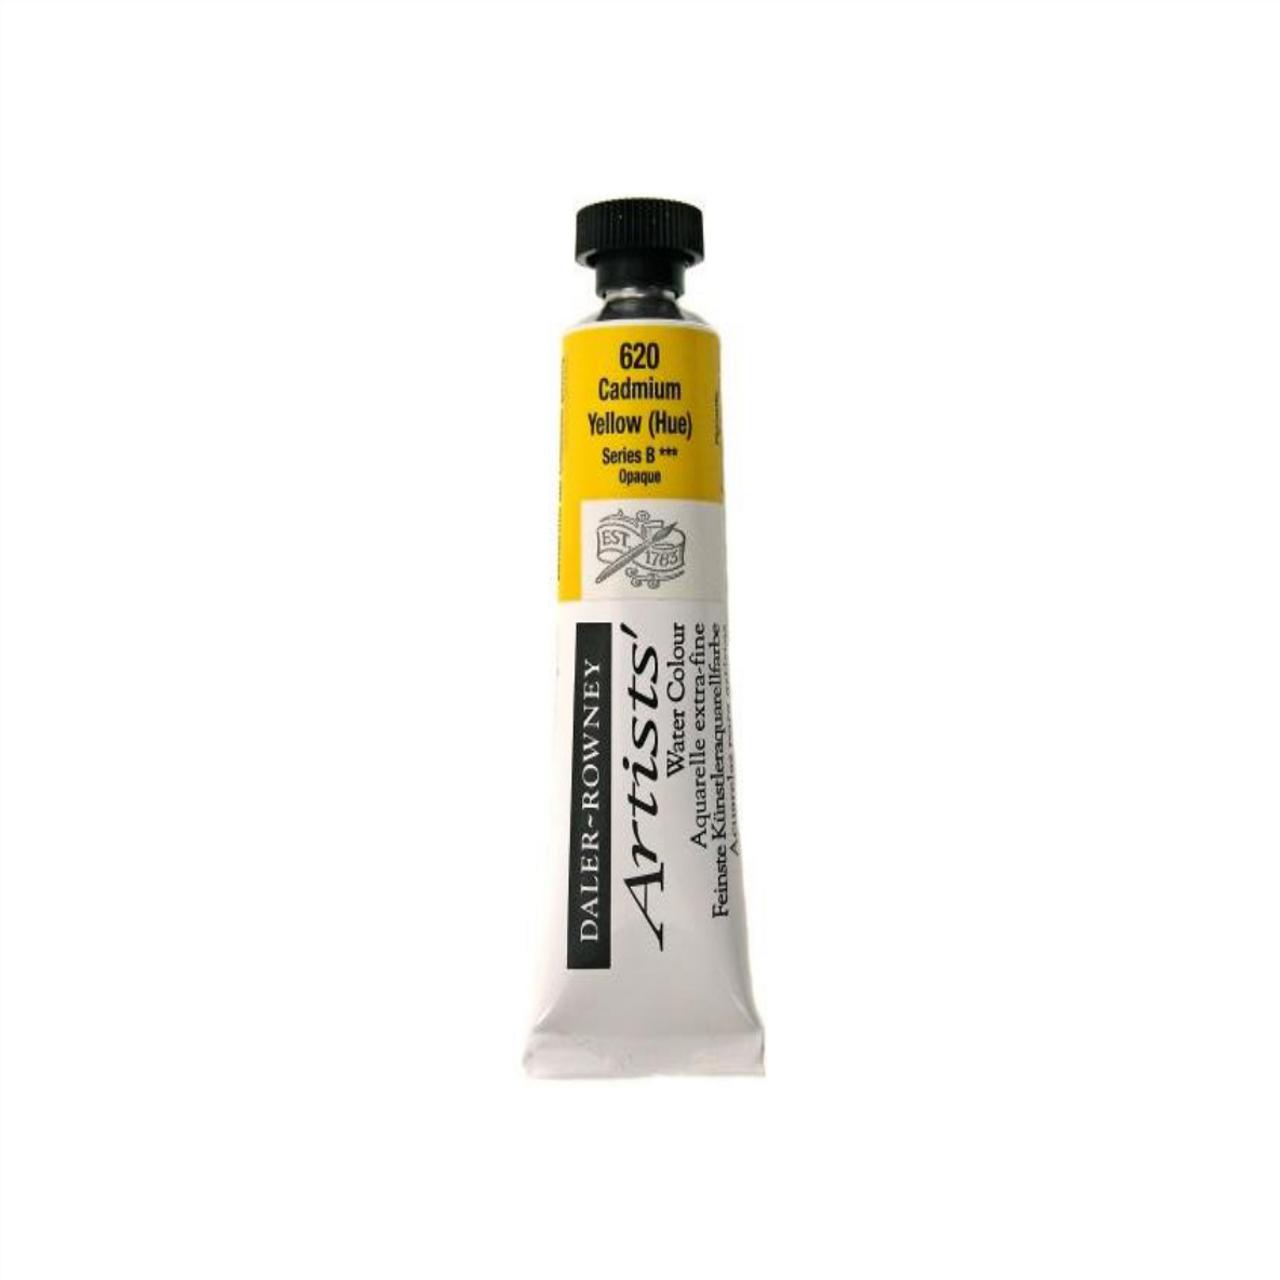 Daler-Rowney Artists' Watercolour Tube 15ml - Cadmium Yellow Hue #620